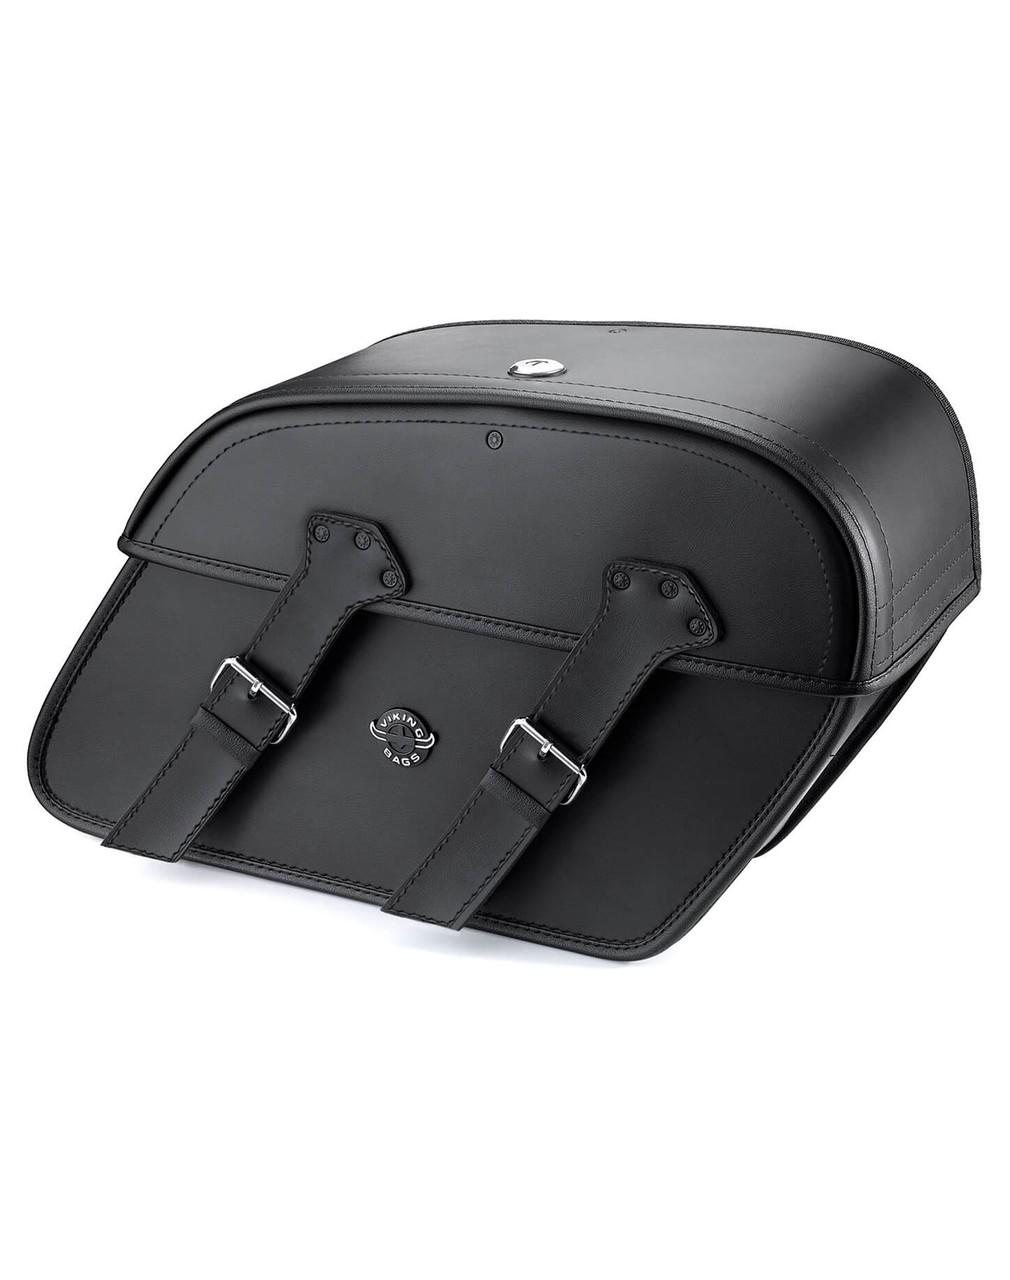 Viking Raven Large Leather Motorcycle Saddlebags  For Harley Softail Cross Bones FLSTSB Main Bag View